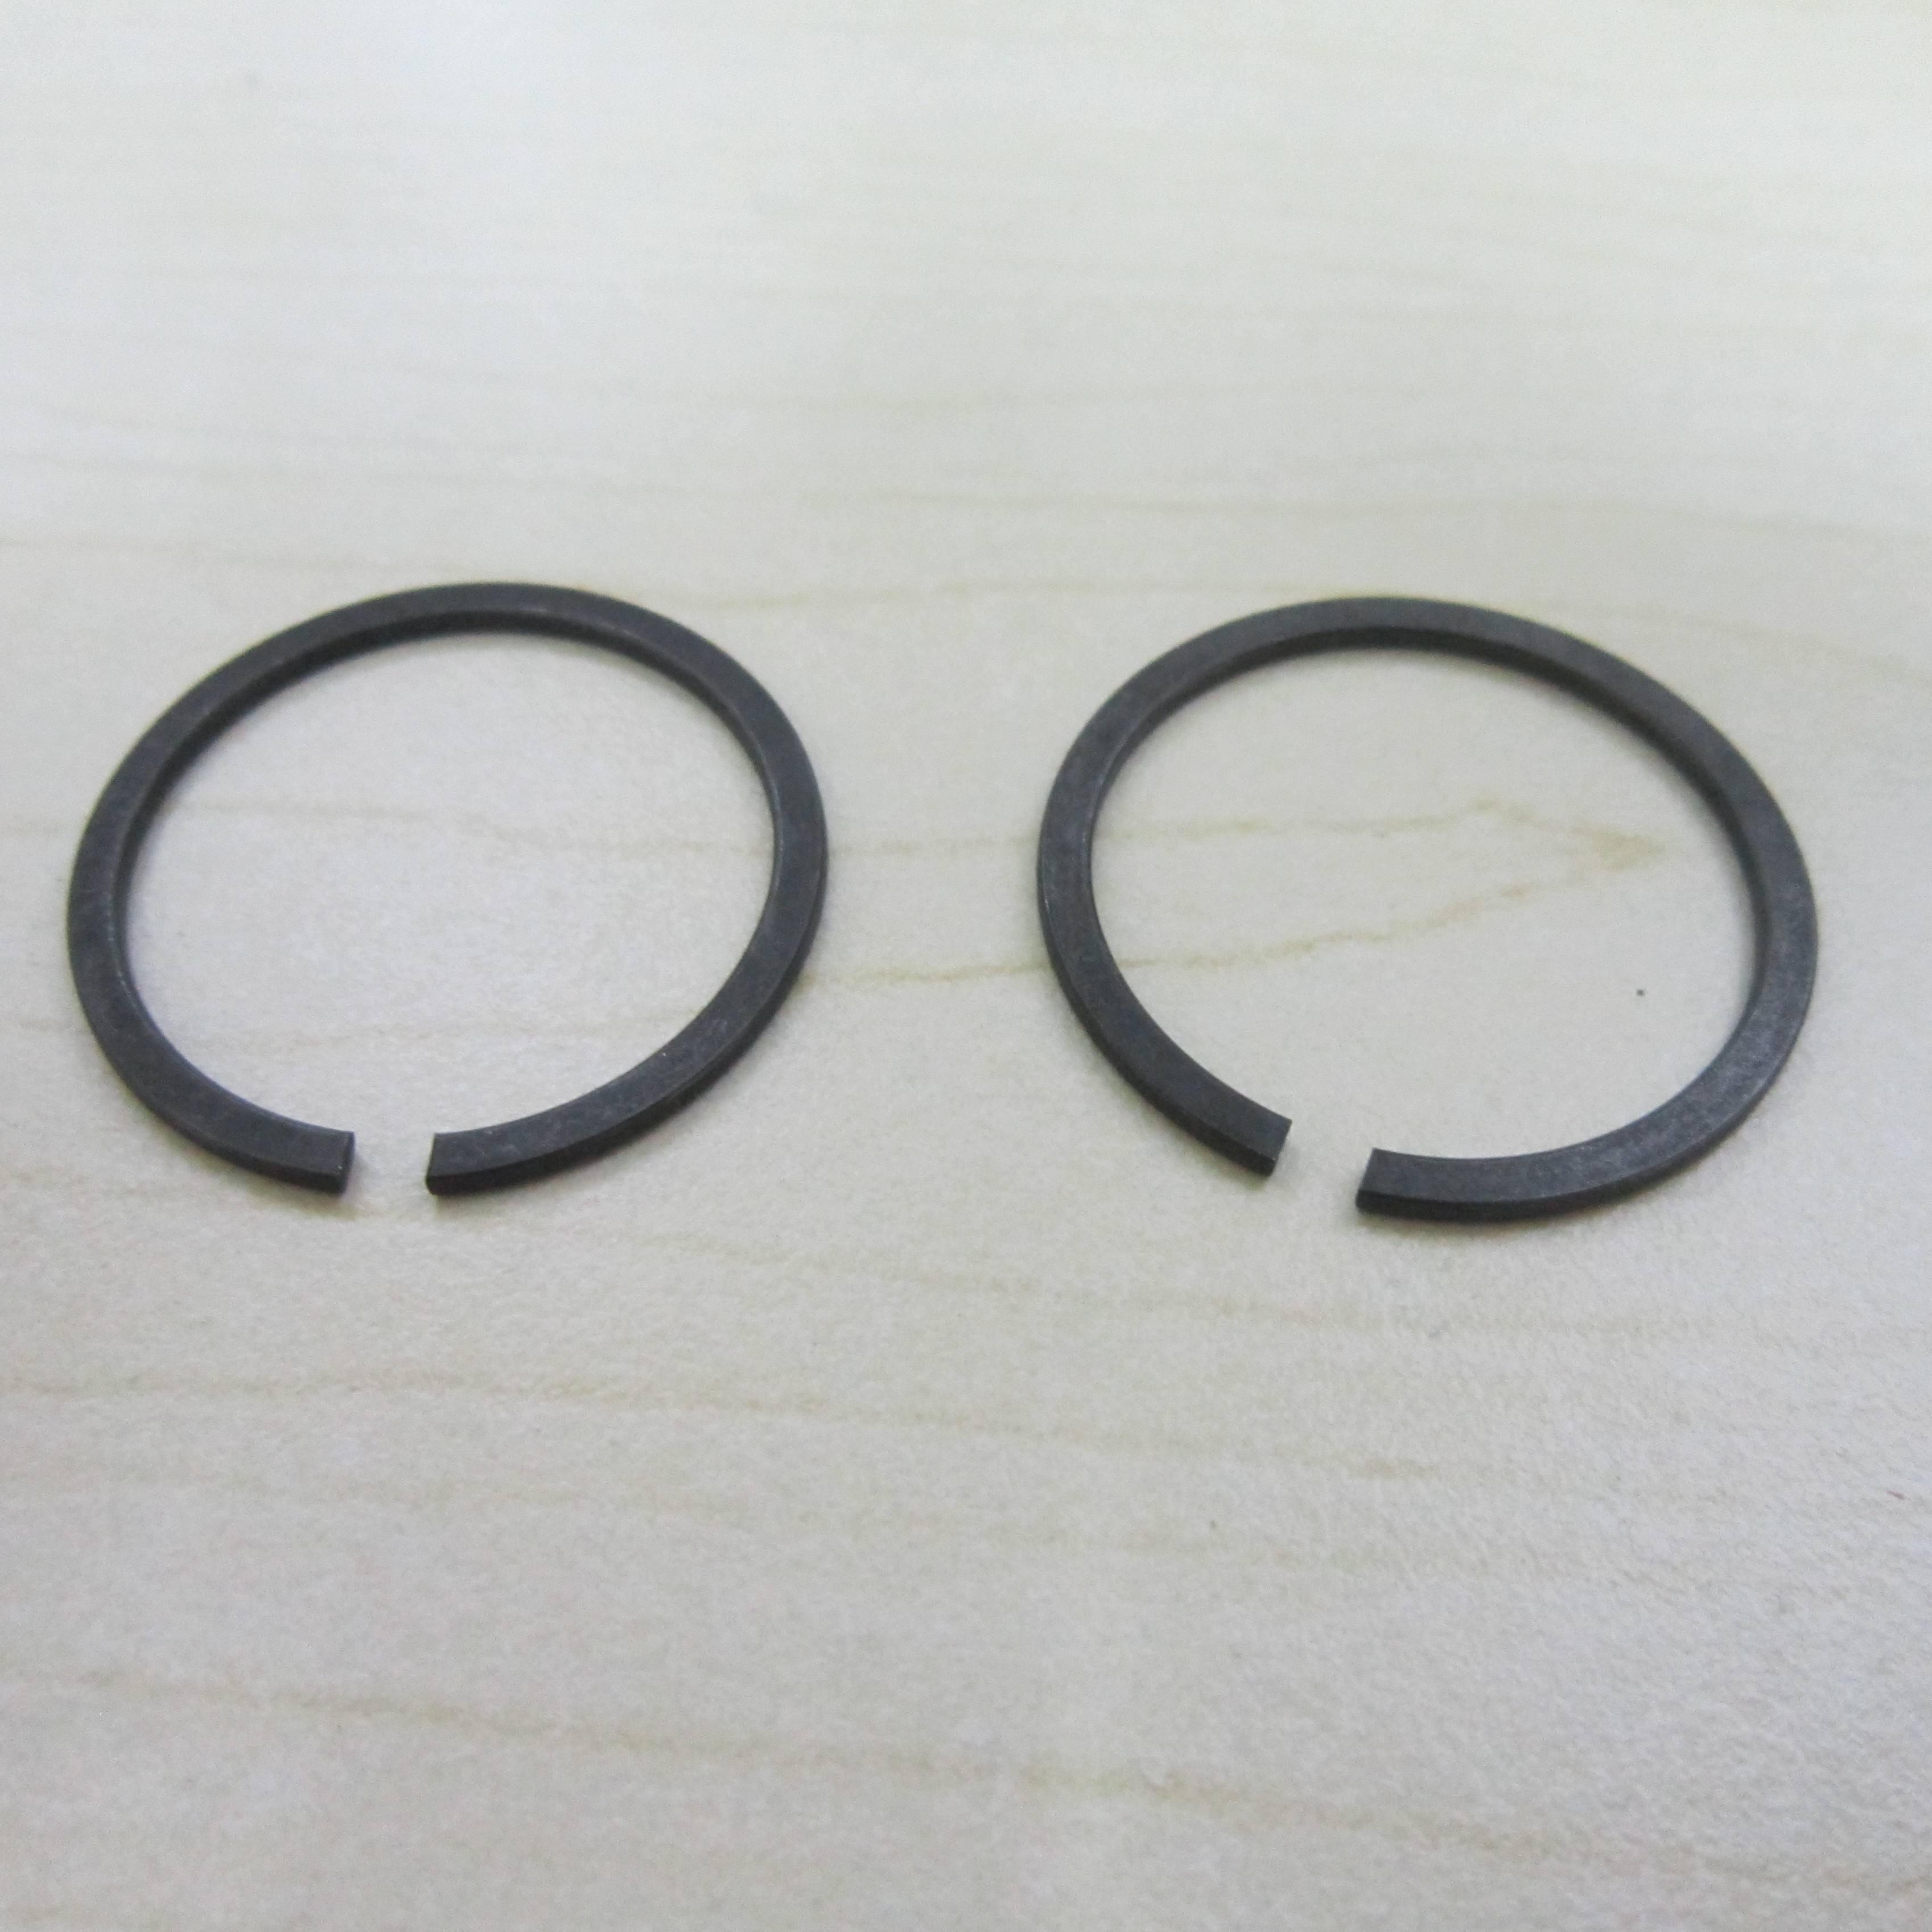 M55 External Snap Rings Metric 50 pcs Spring Steel DIN 7993A